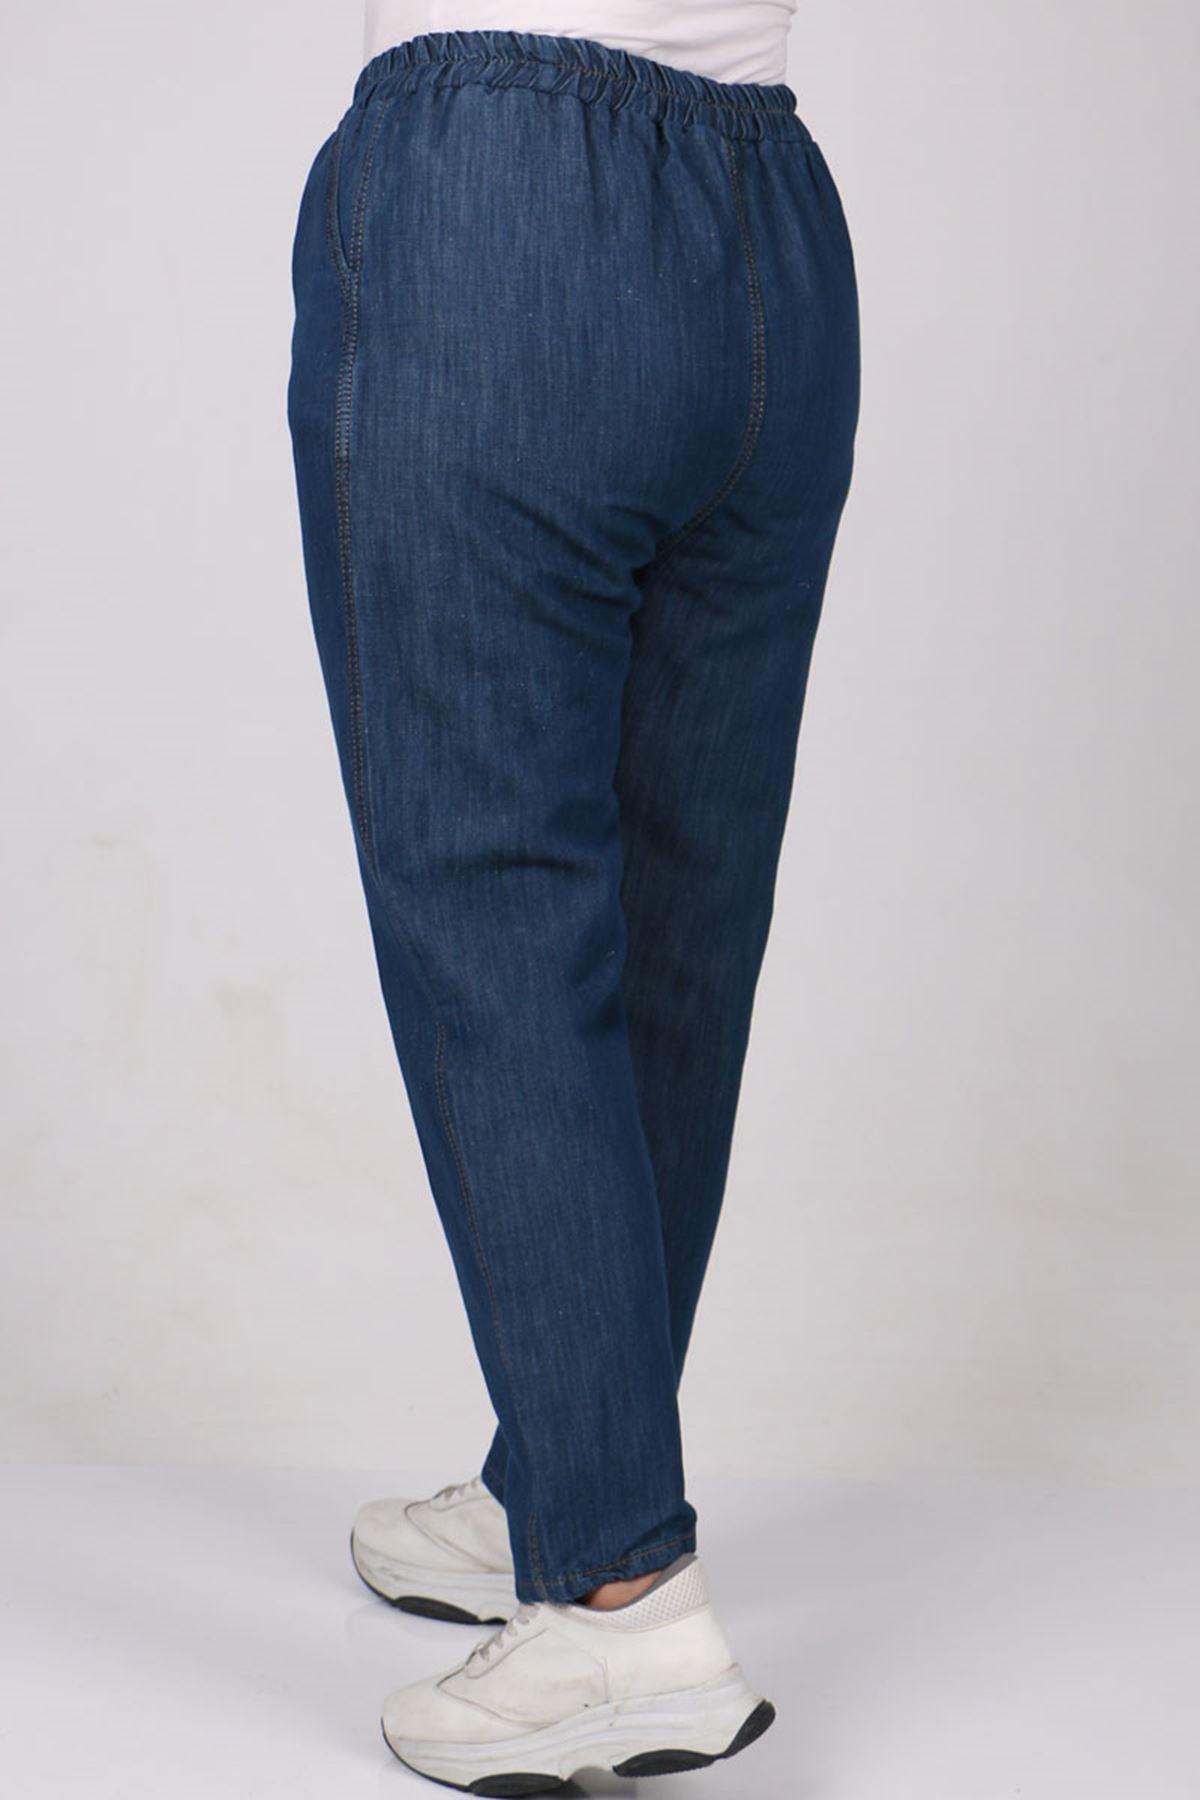 9173 Büyük Beden Dar Paça Kot Pantolon - Lacivert